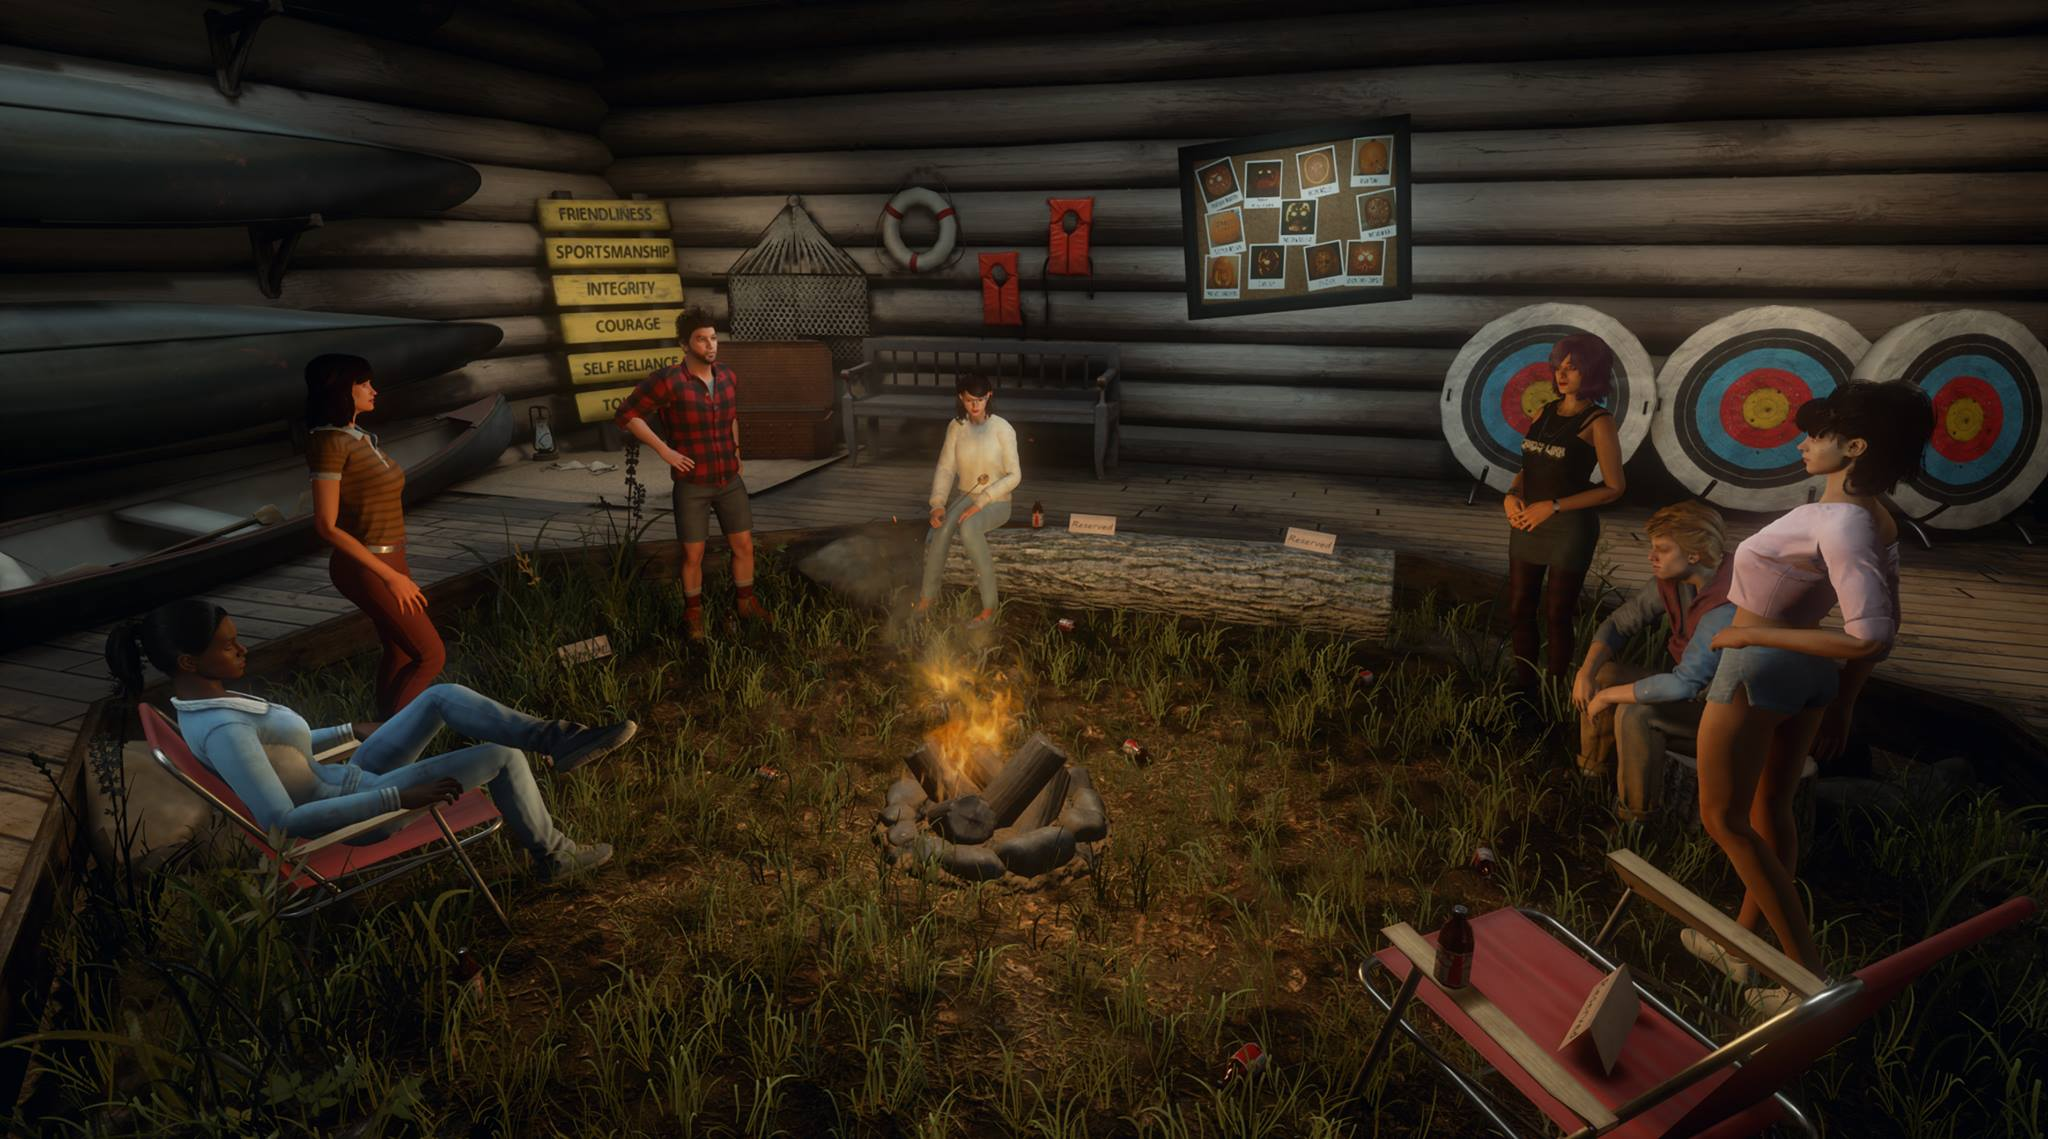 Camp counselor part 2 - 1 part 3